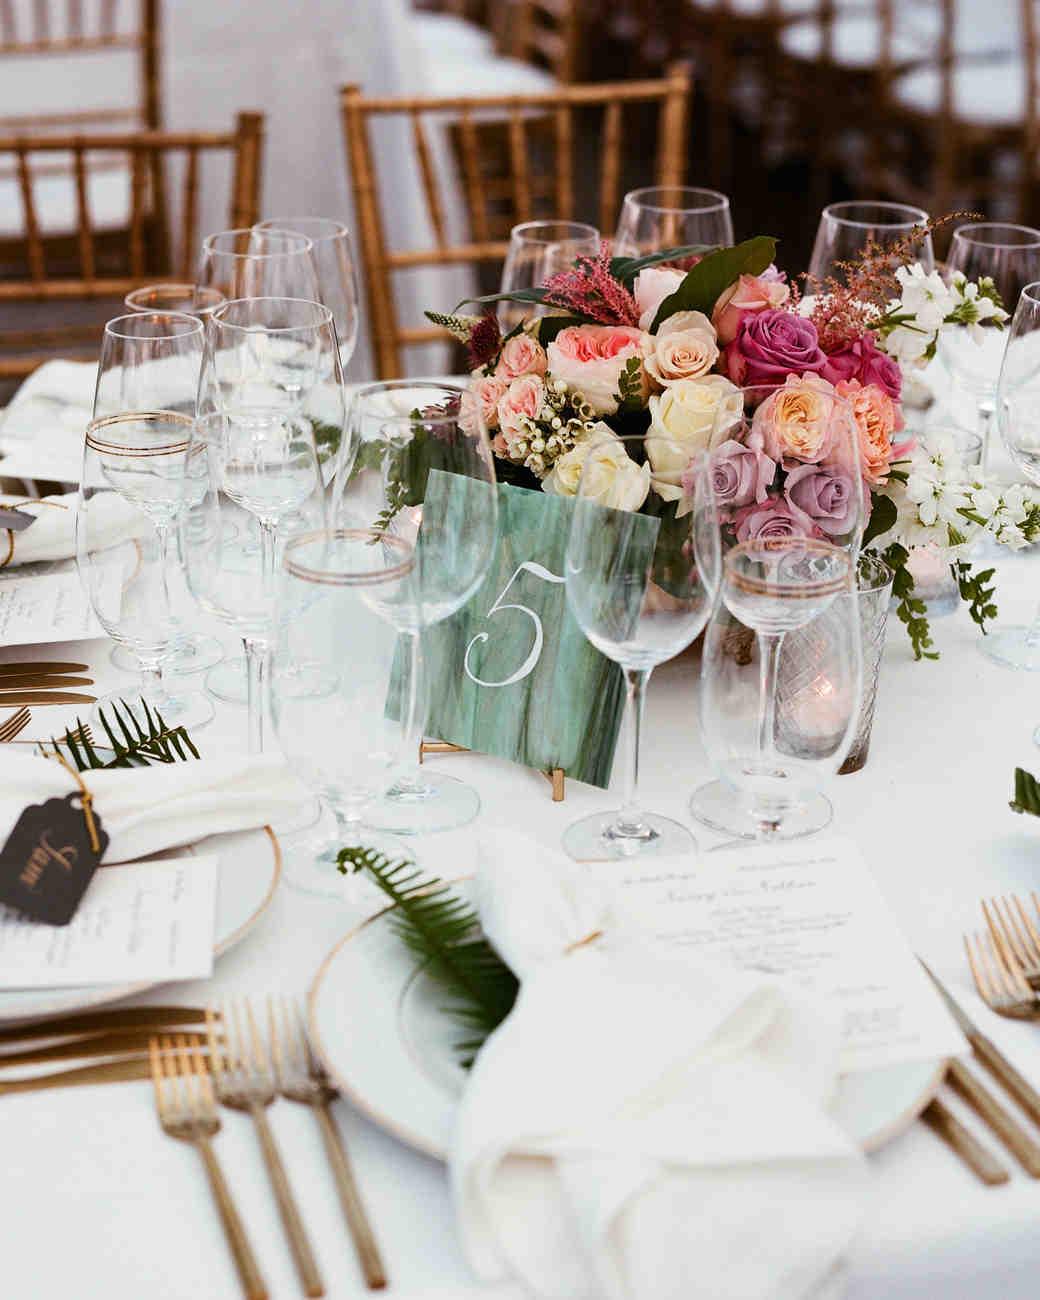 nancy-nathan-wedding-table-number-0912-6141569-0816.jpg